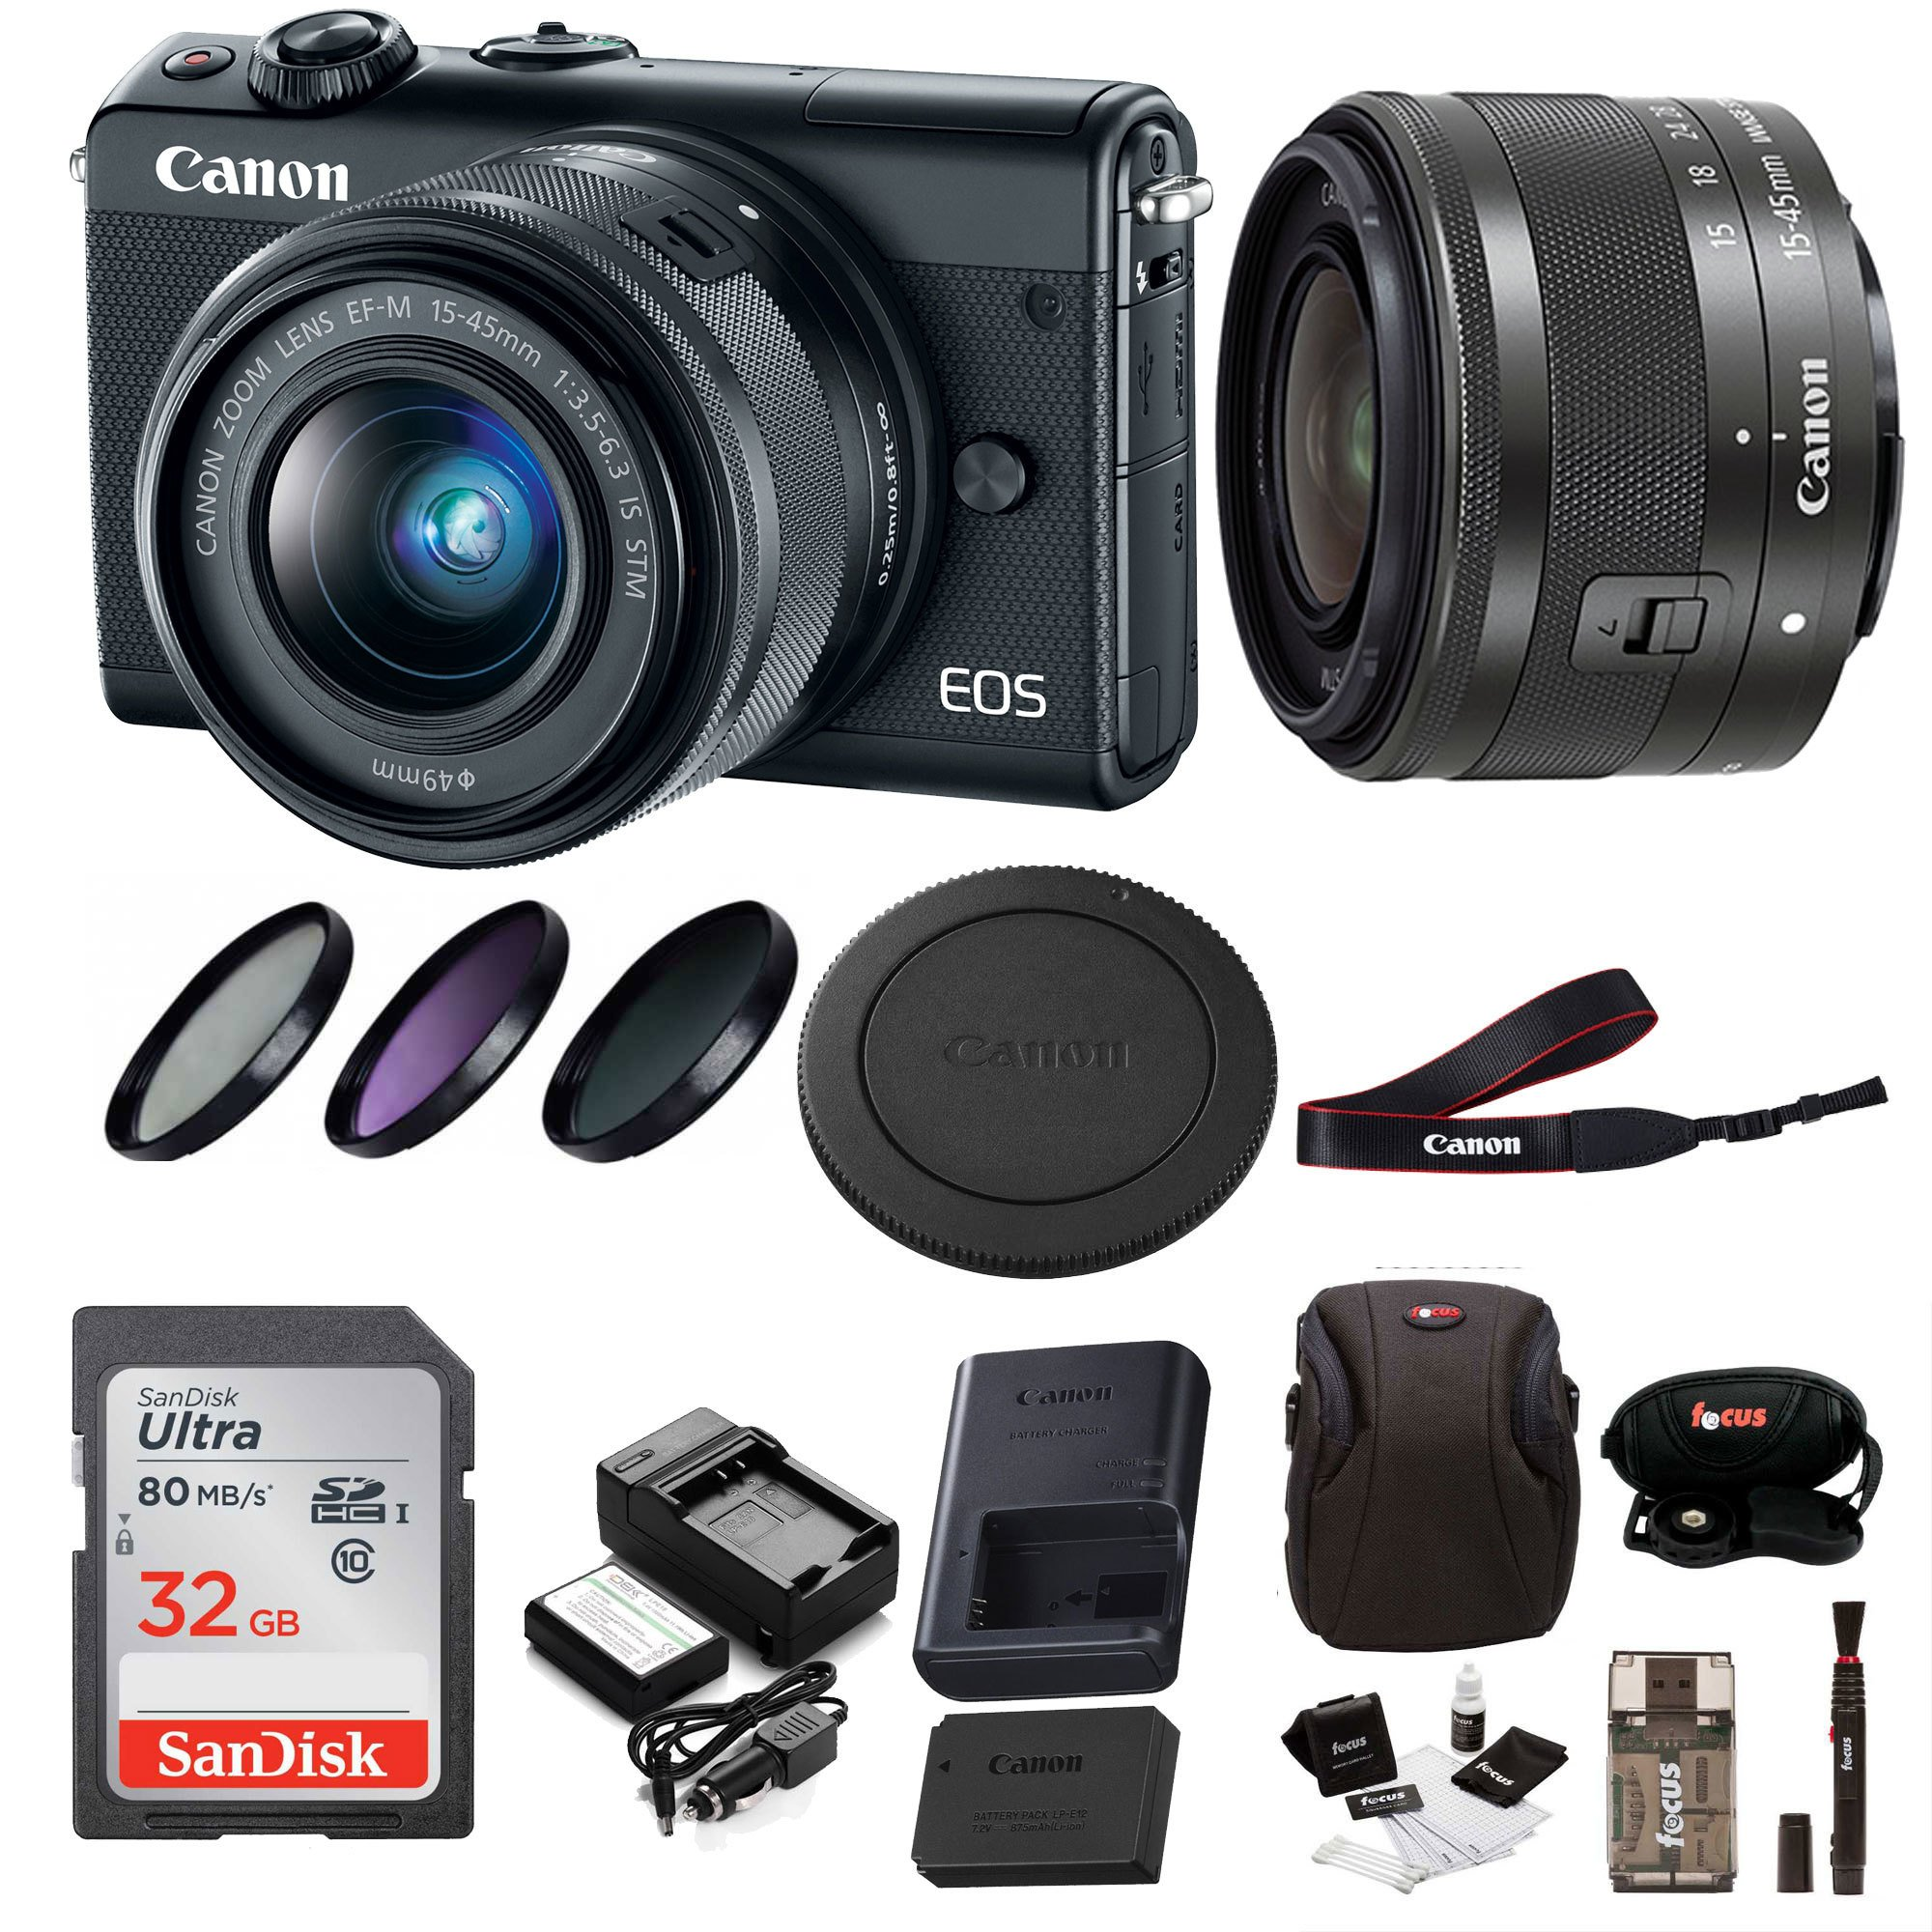 Canon EOS M100 Mirrorless Digital Camera EF-M 15-45mm lens (Black) + 32GB Memory Card + Filter Kit + Bundle by Focus Camera